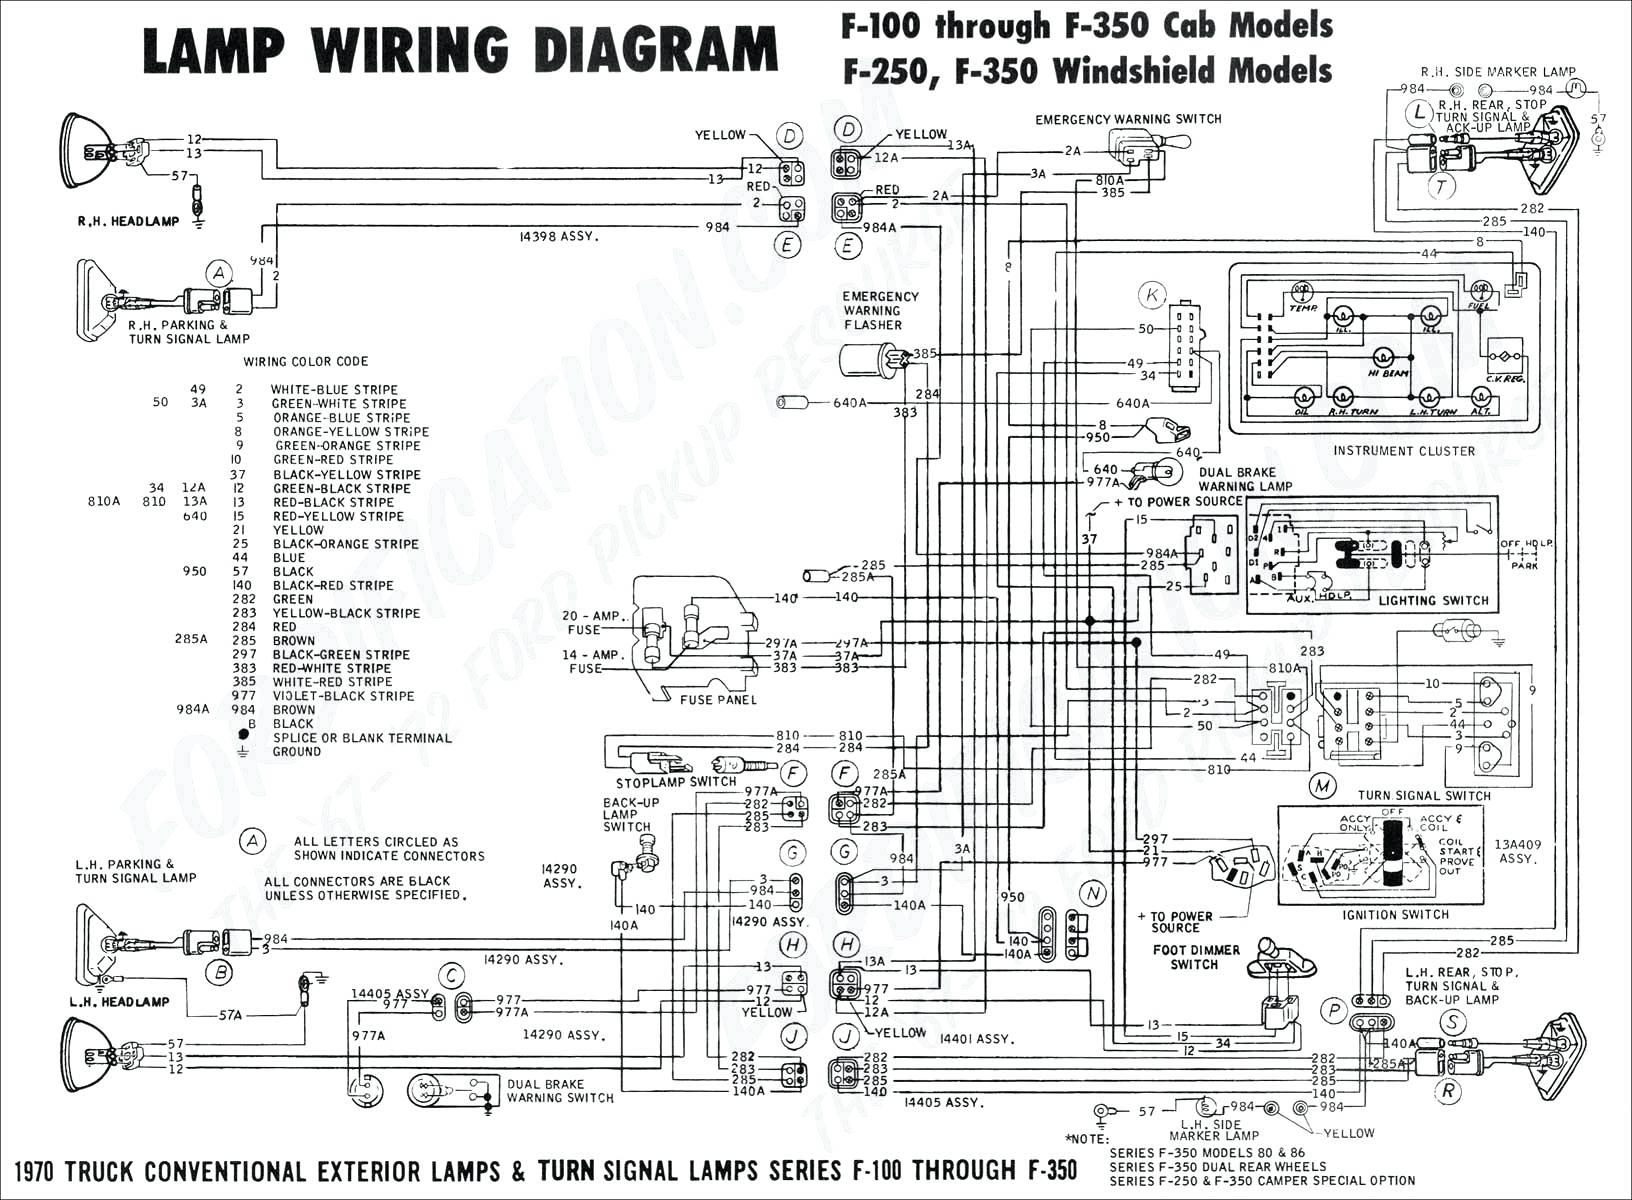 Hk42fz011 Wiring Diagram - Hk42fz009 Wiring Diagram Sample Wiring Diagram Sample Rh Faceitsalon Hk42fz011 Replacement Hk42fz011 Replacement 13b